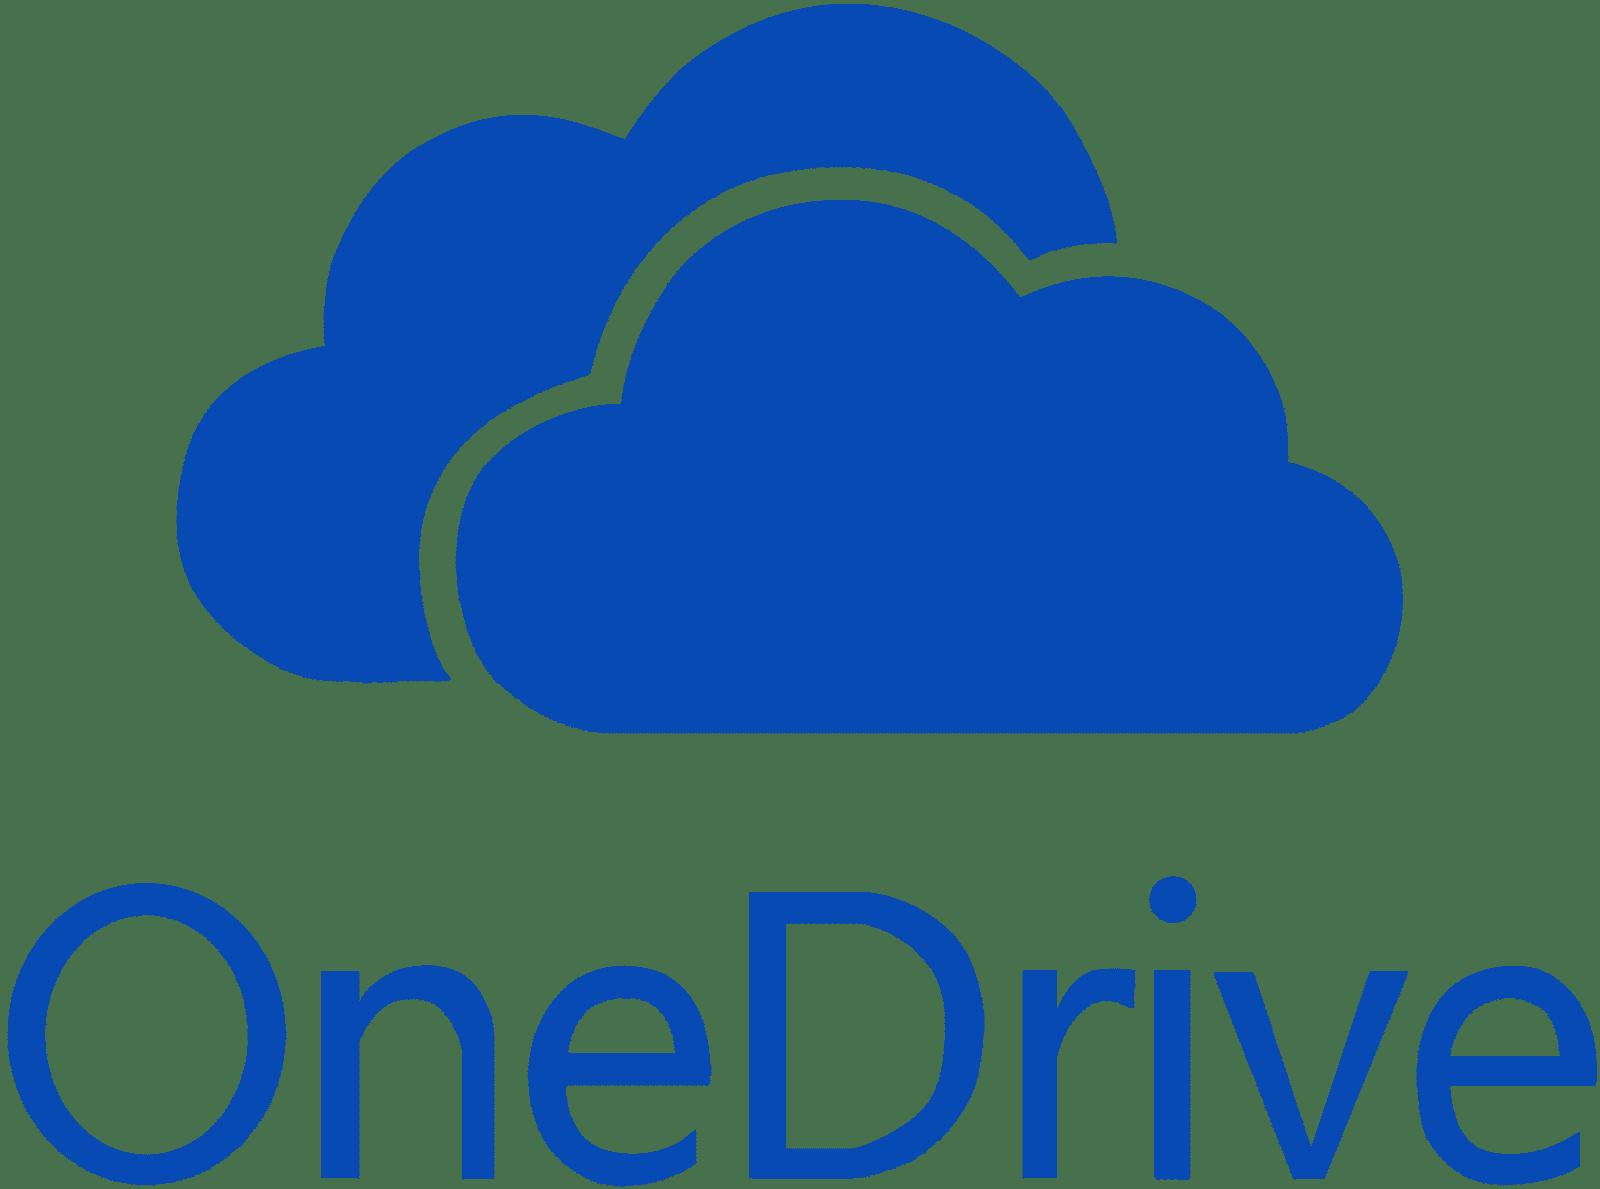 one_drive_google